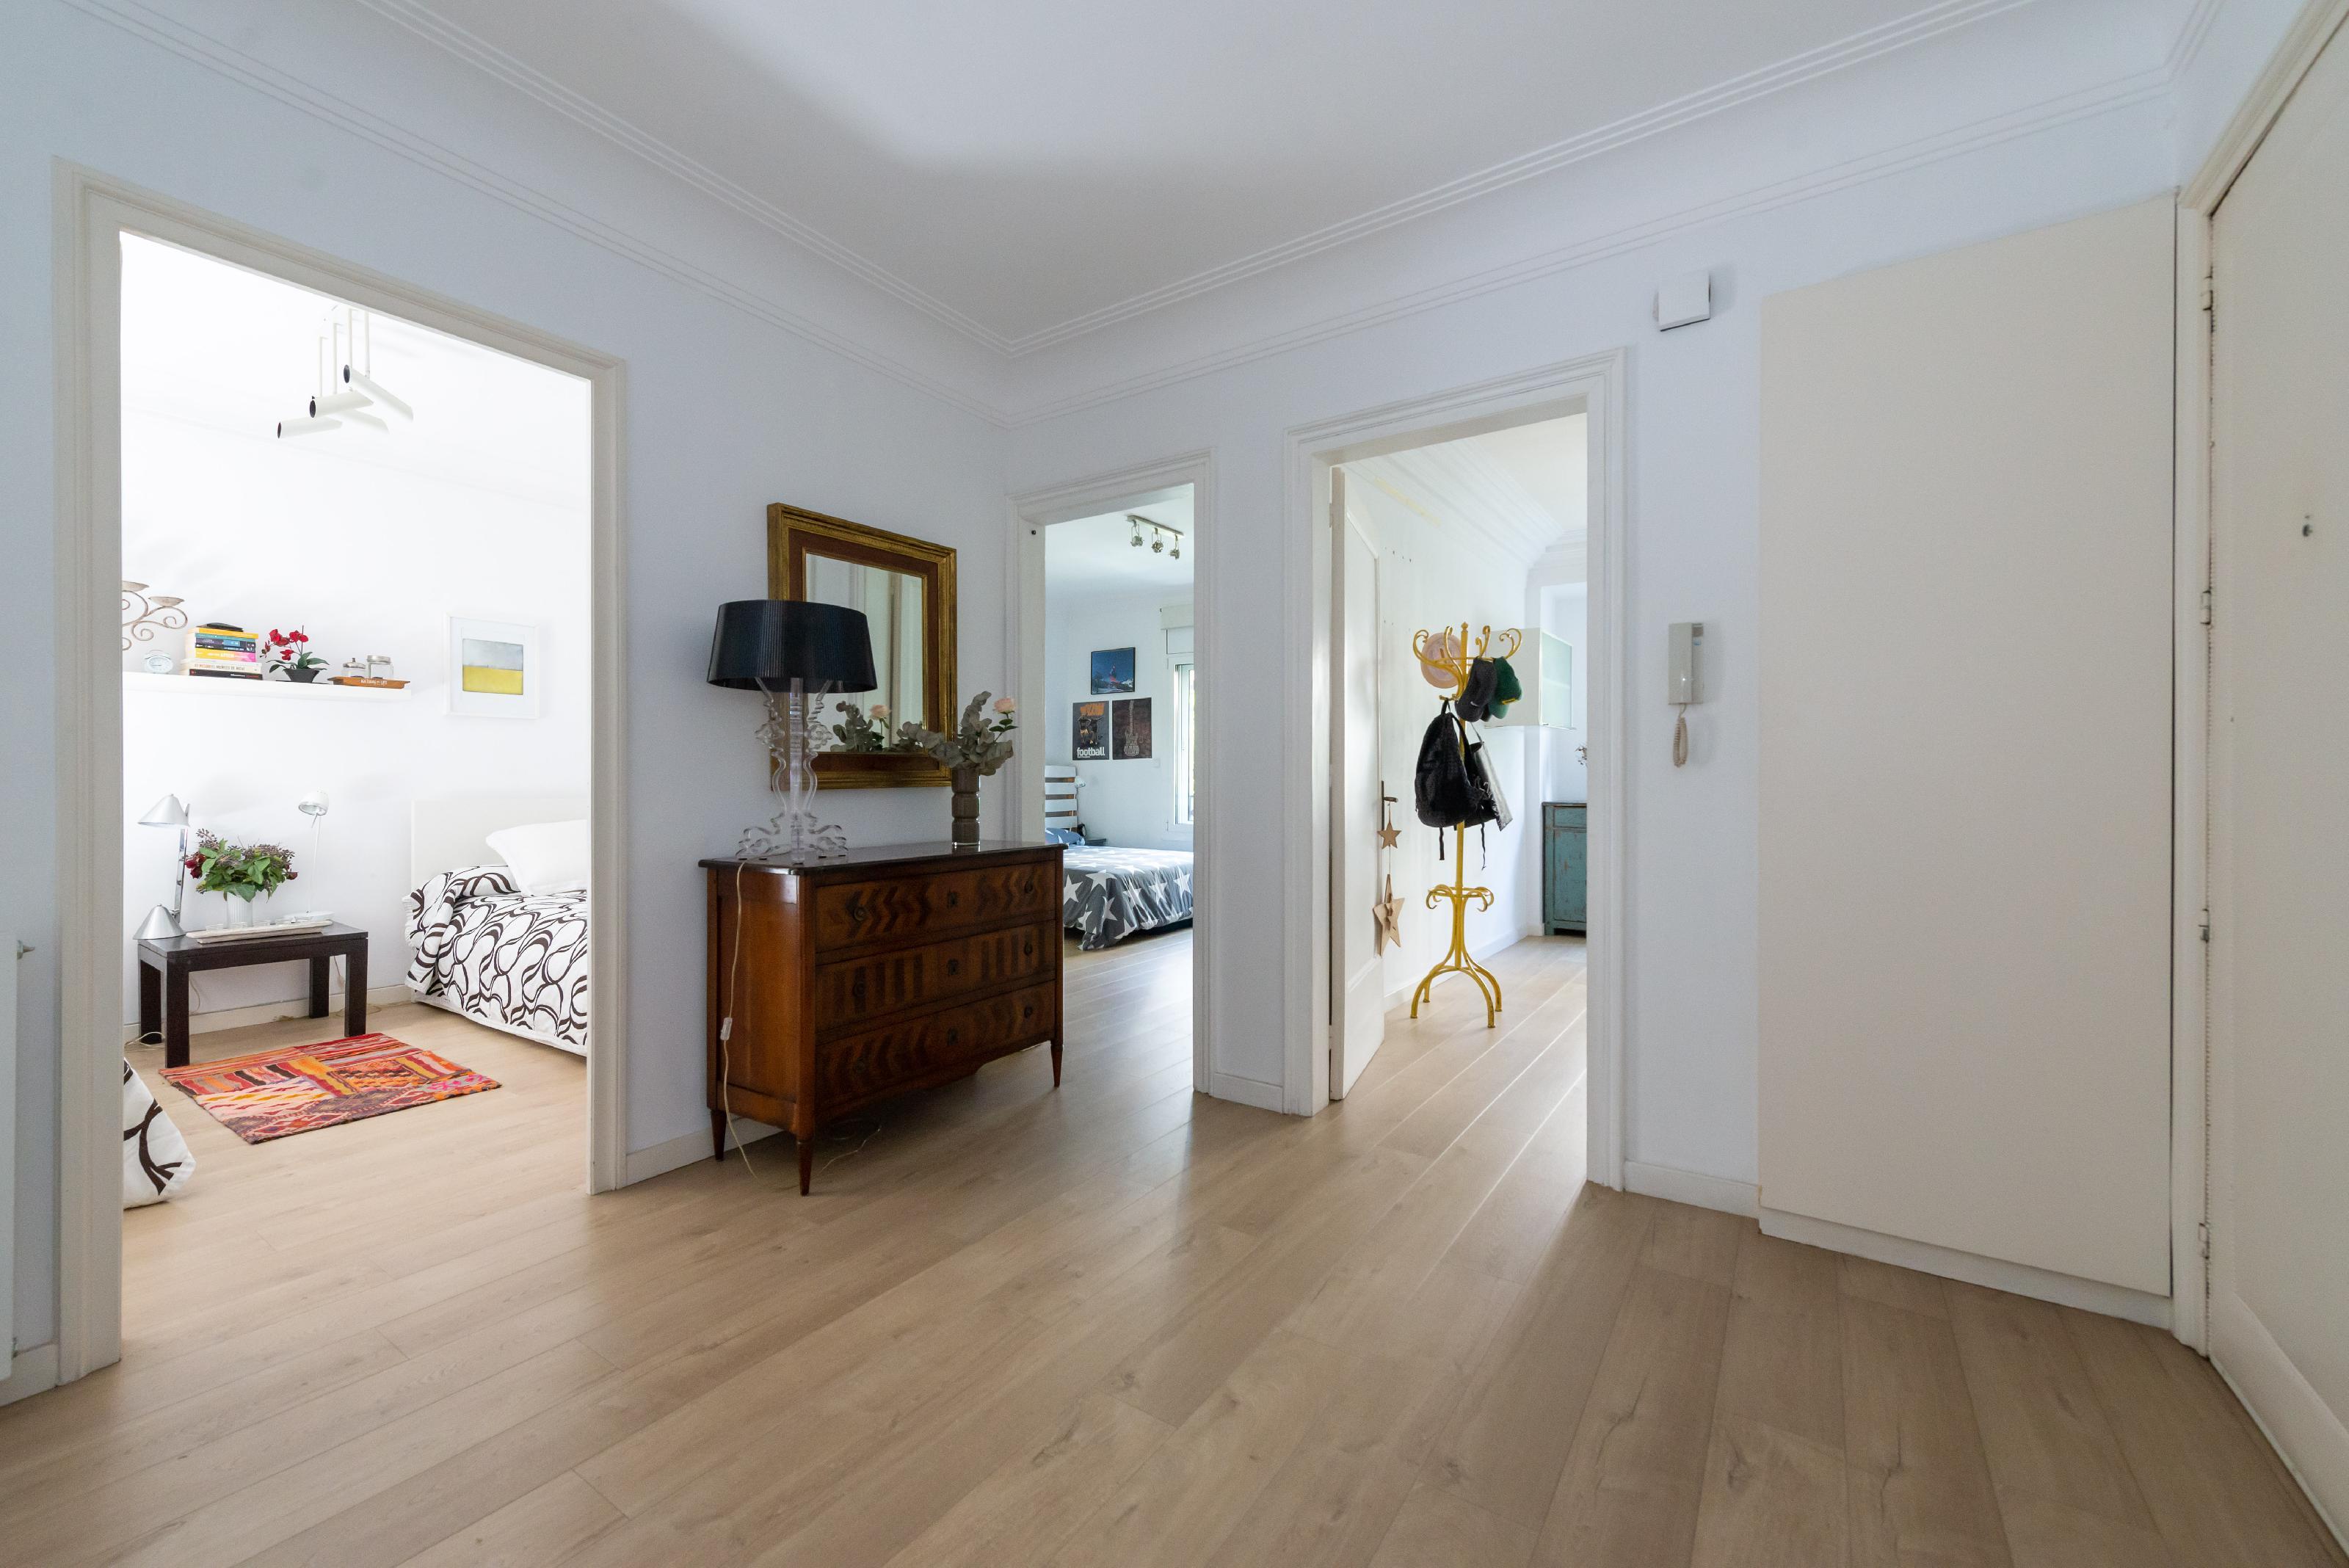 250005 Flat for sale in Sarrià-Sant Gervasi, Sant Gervasi-Galvany 16